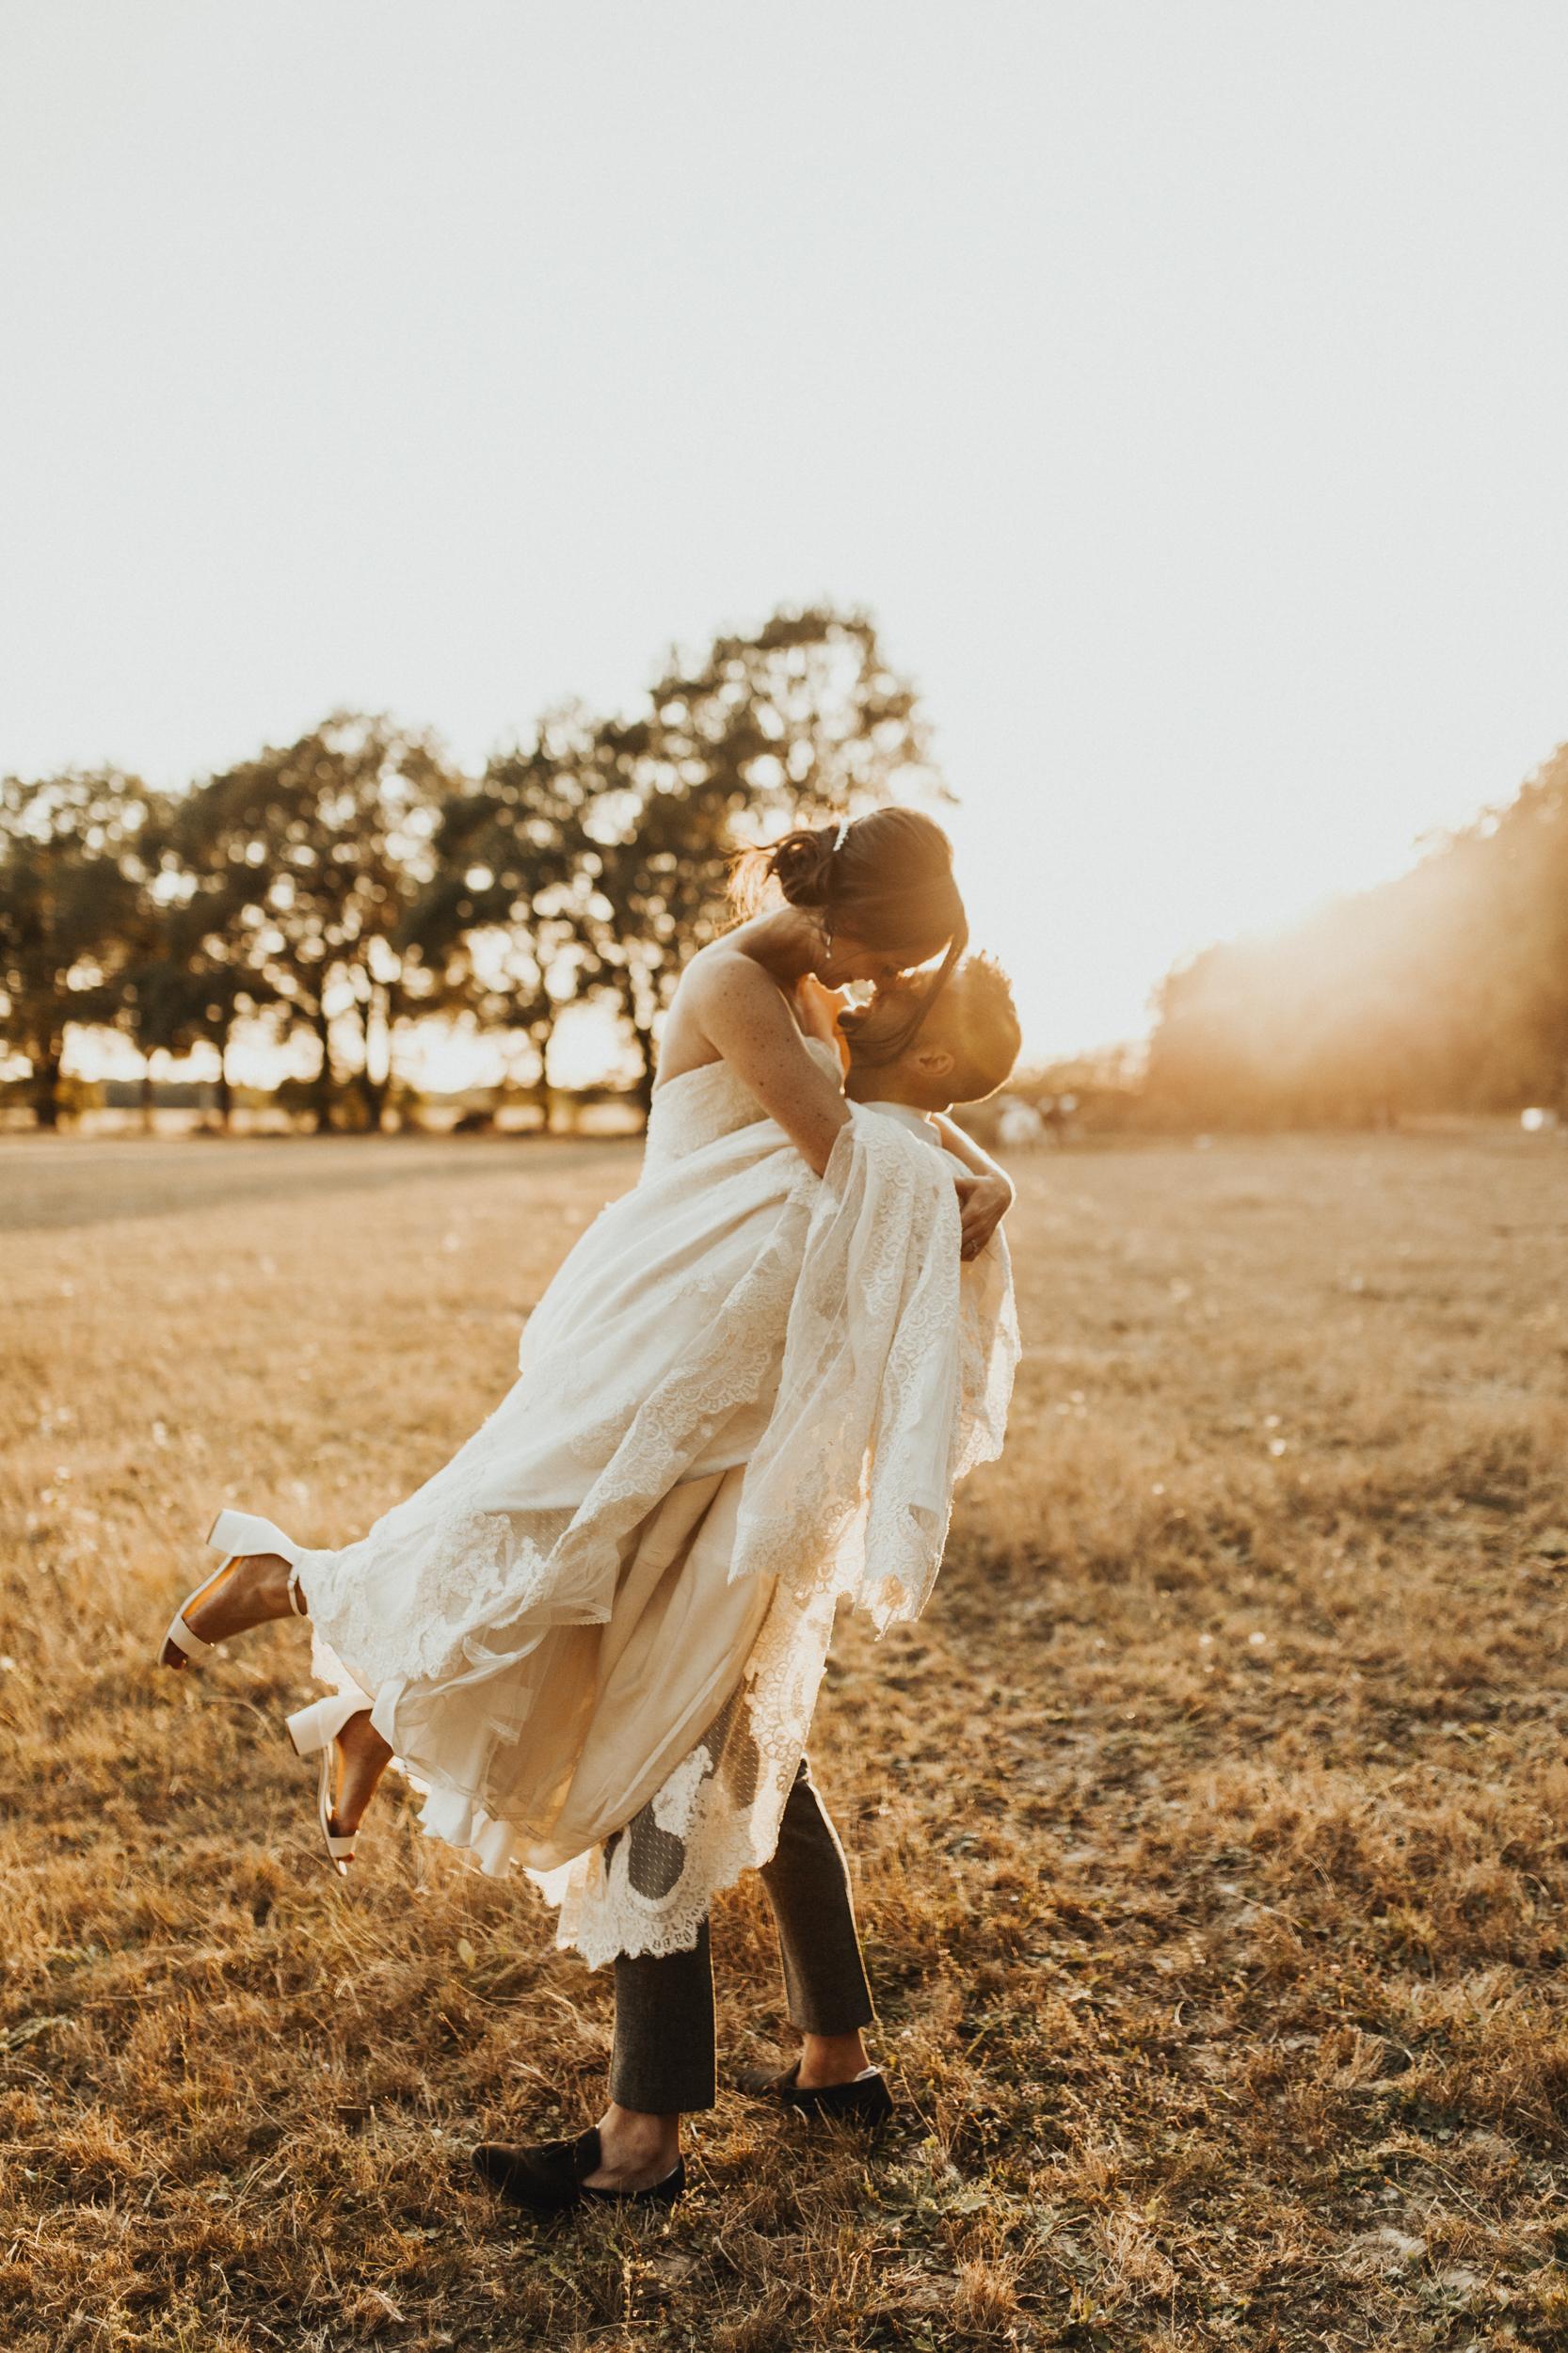 Amy-Zac-Destination-Wedding-France-Manoir-Foulquetiere-Darina-Stoda-Photography-91.jpg